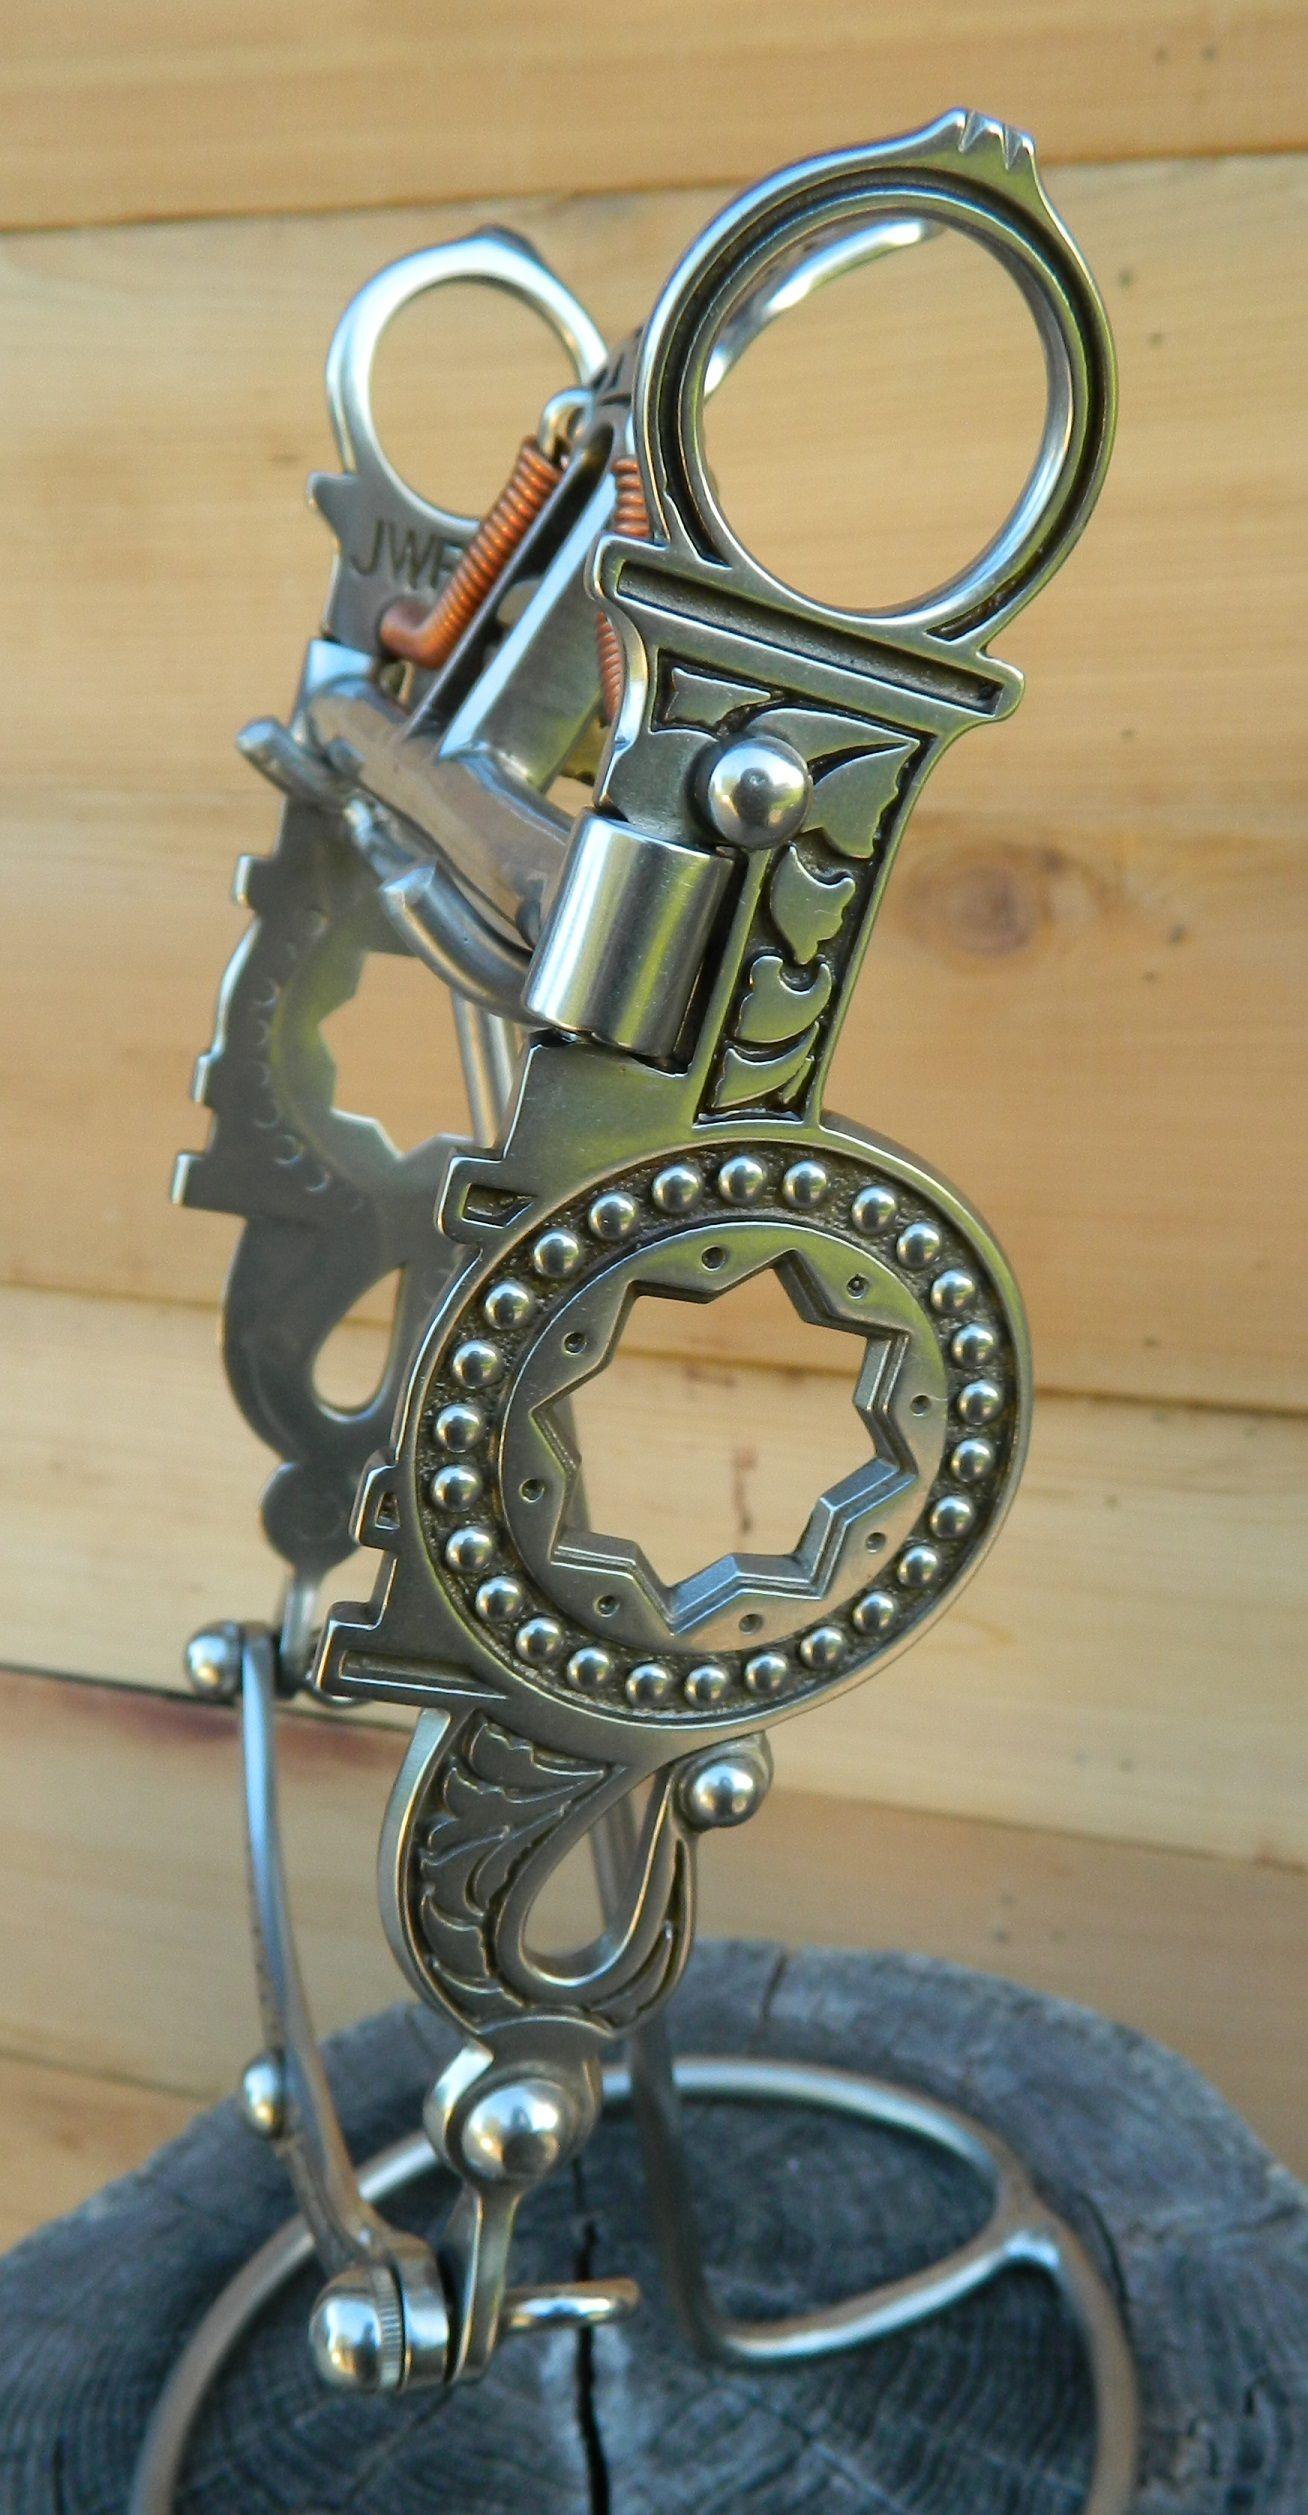 Jeremiah Watt Products spade bit available at 33ranchandsaddlery.com